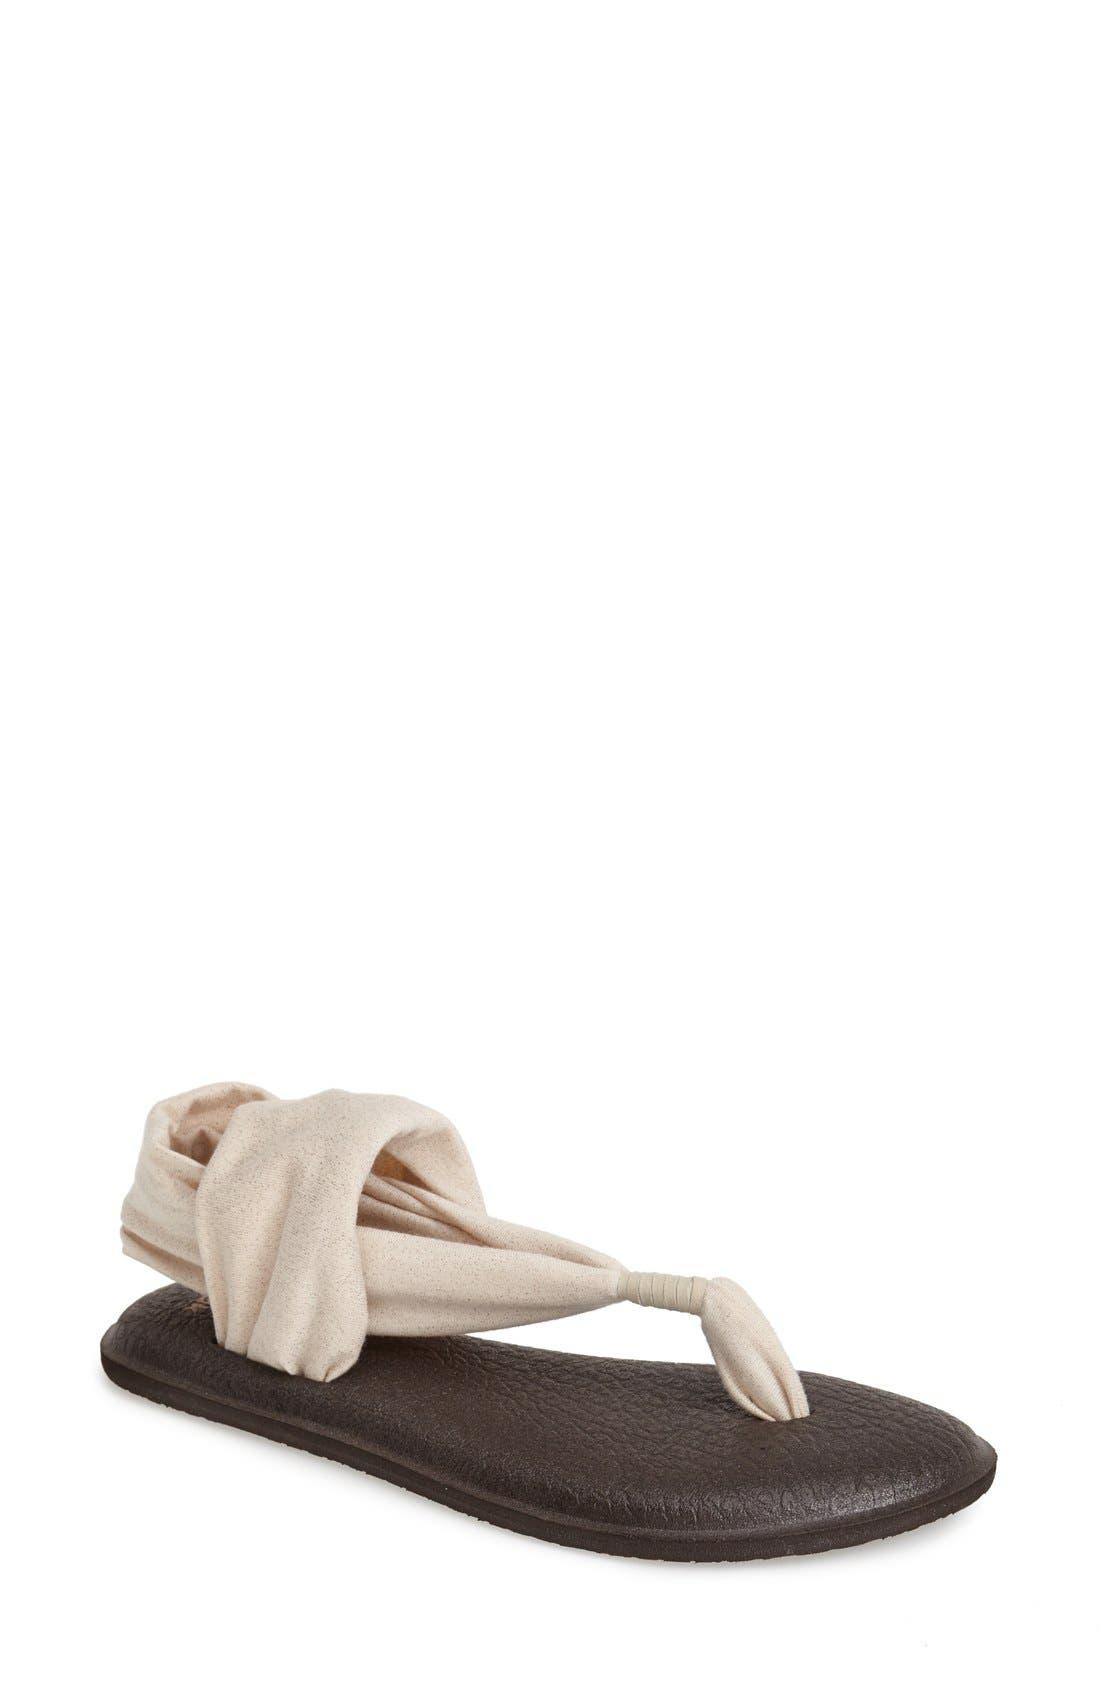 'Yoga Metallic Sling' Sandal,                         Main,                         color, 650